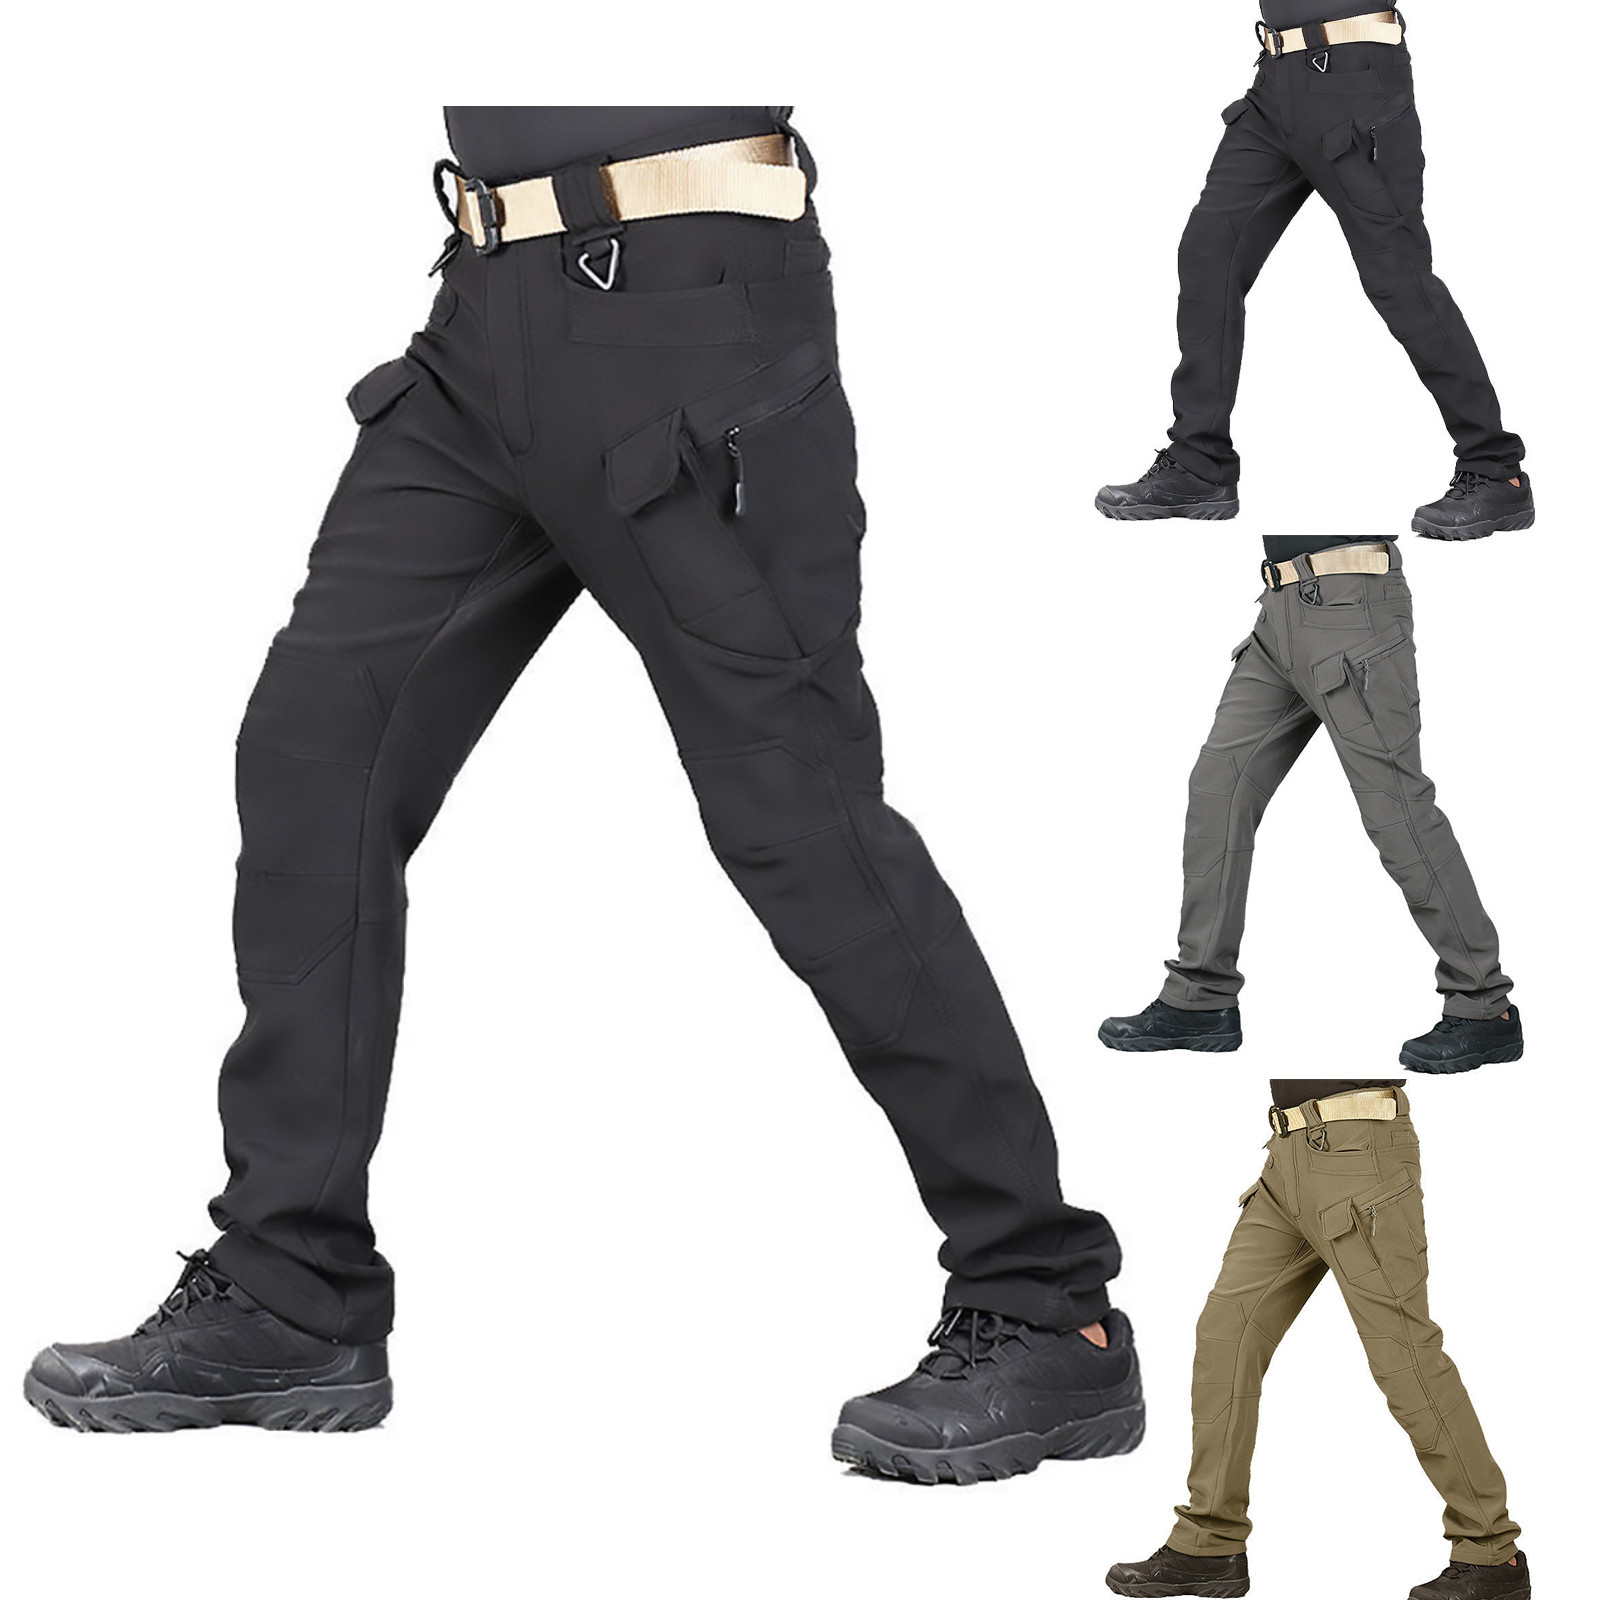 2021 Men New Tactical Army Combat Military Camp Fish Hike Trek Climb Outdoor softshell waterproof pants Ski Trousers Fleece